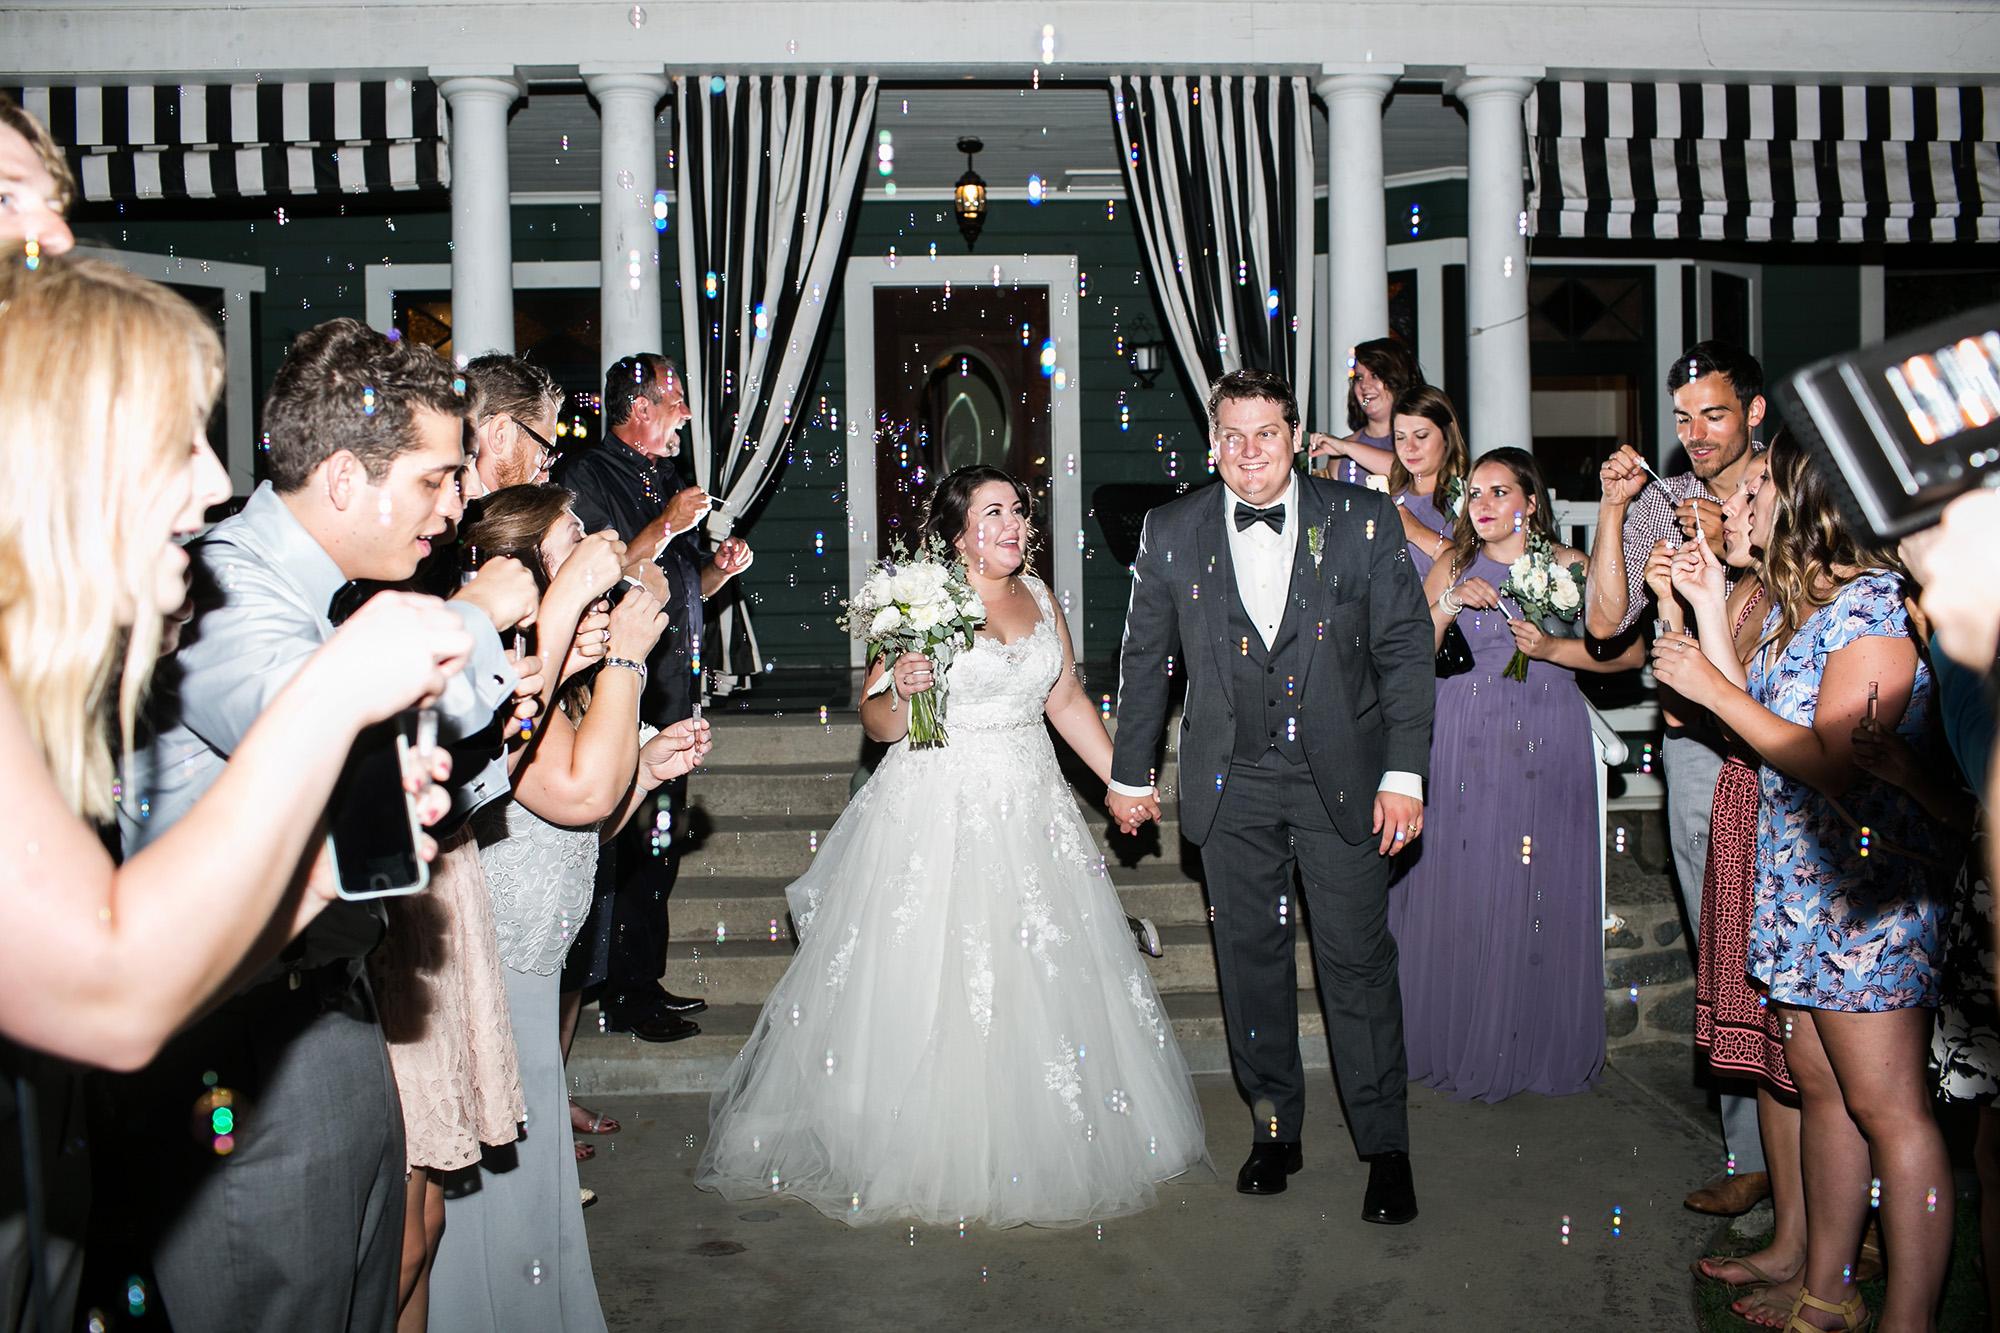 christmas-house-weddings-receptions-carrie-vines-226.jpg